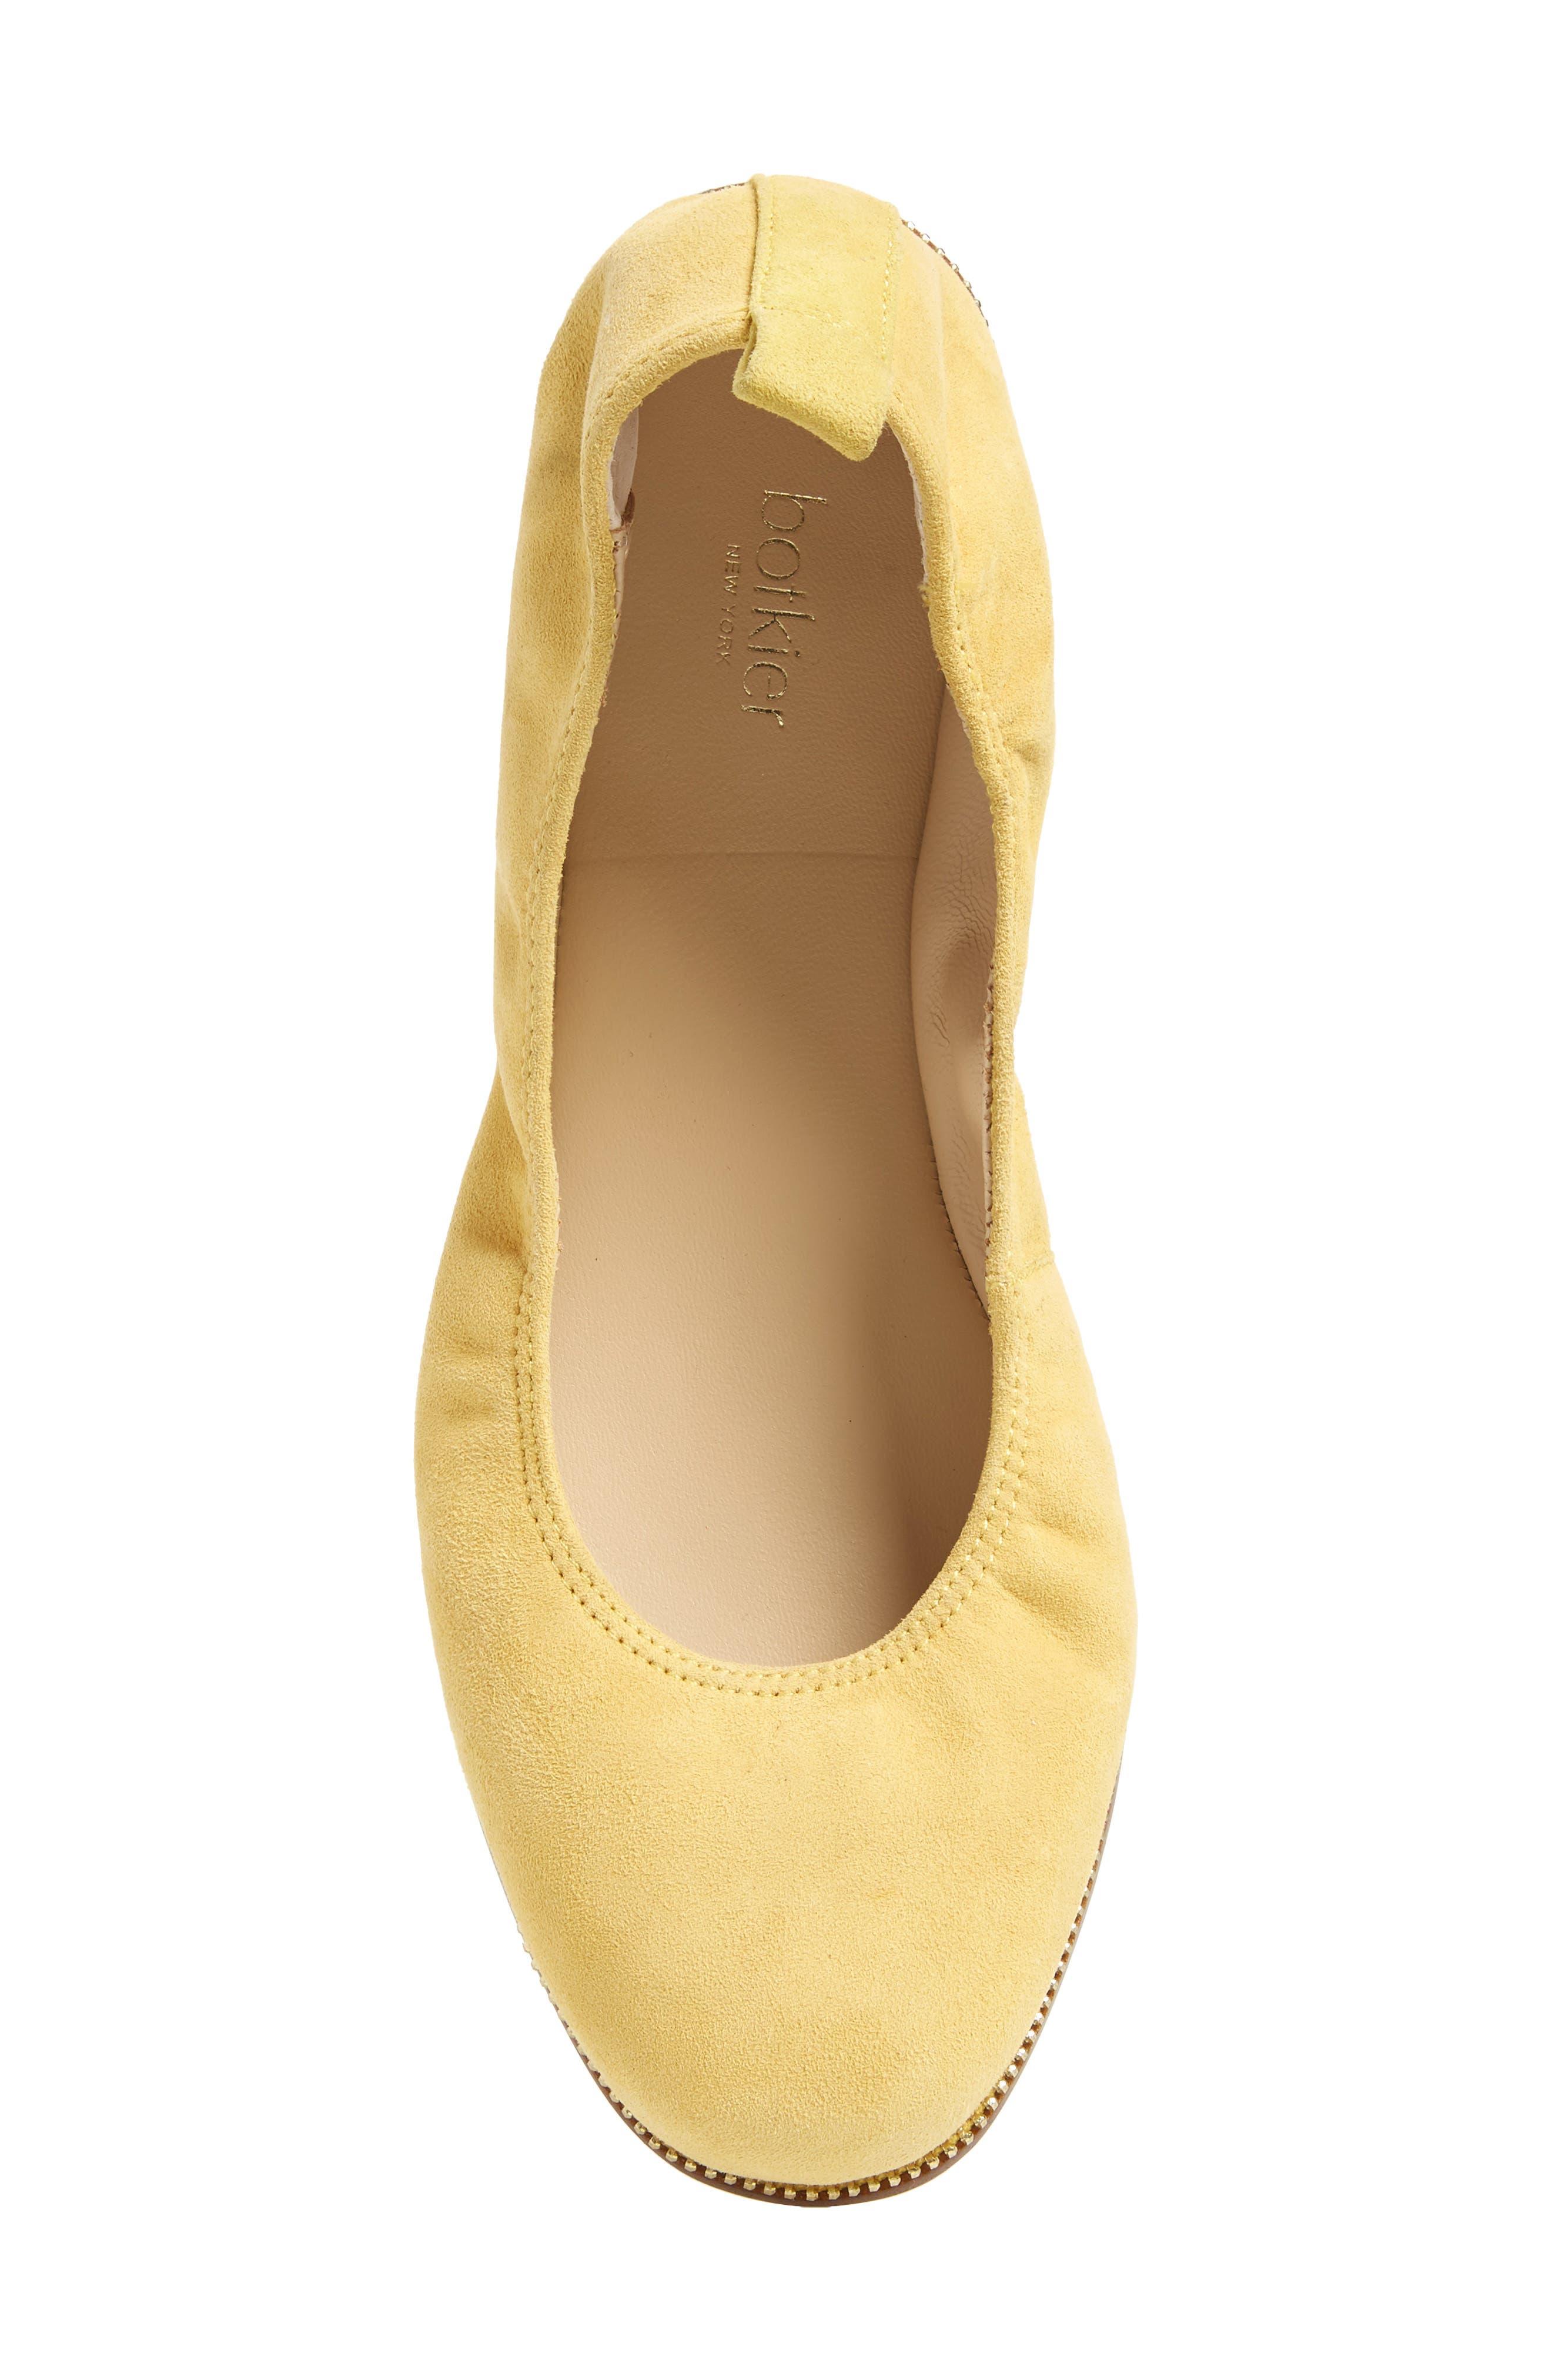 Mason Ballet Flat,                             Alternate thumbnail 5, color,                             PINEAPPLE SUEDE